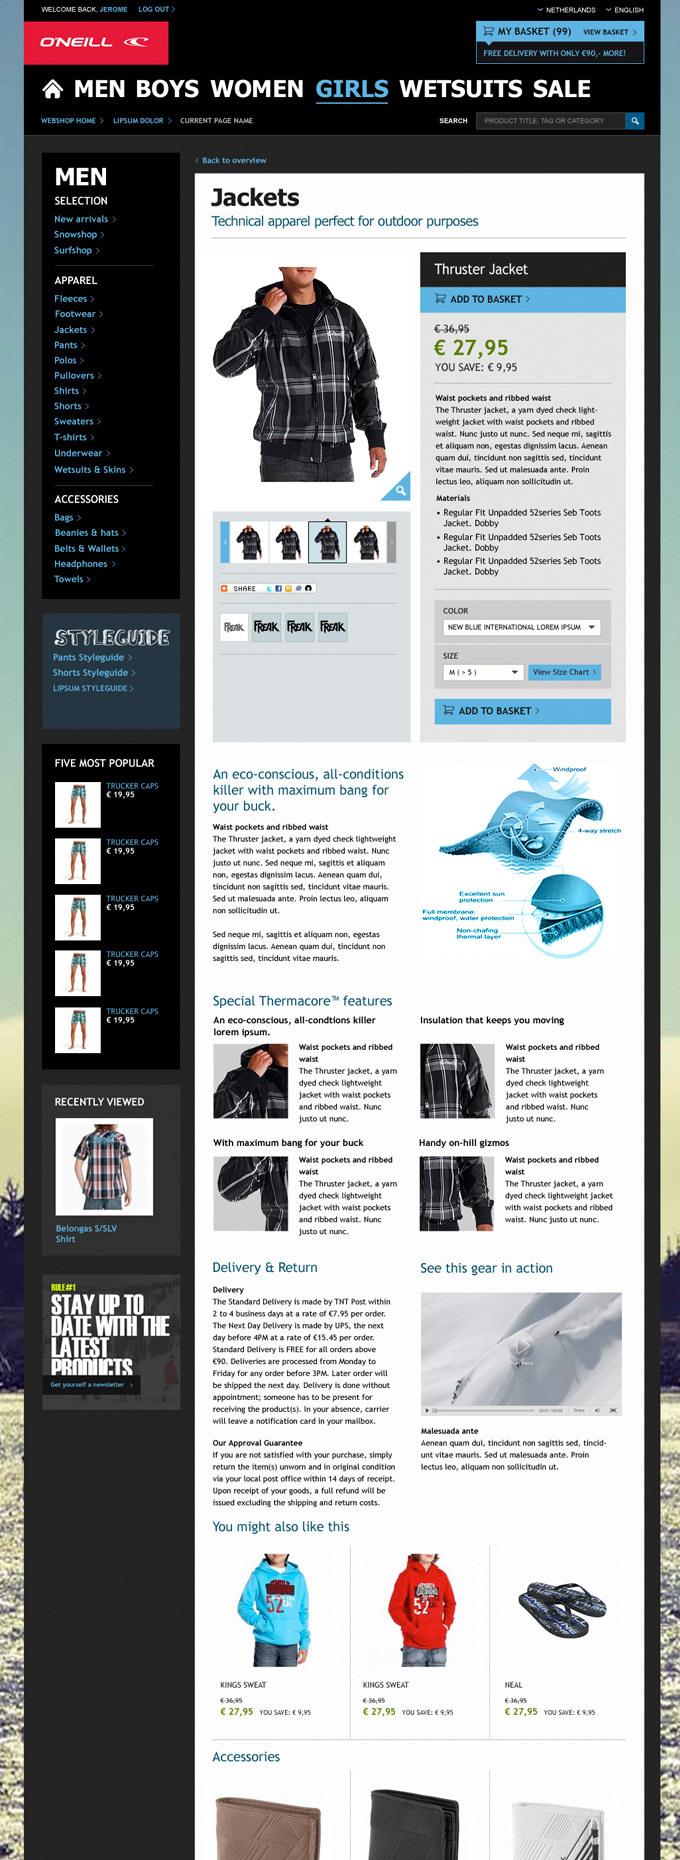 Afbeelding 5 van 7 - O'Neill global webshop re-design - Product Detail pagina